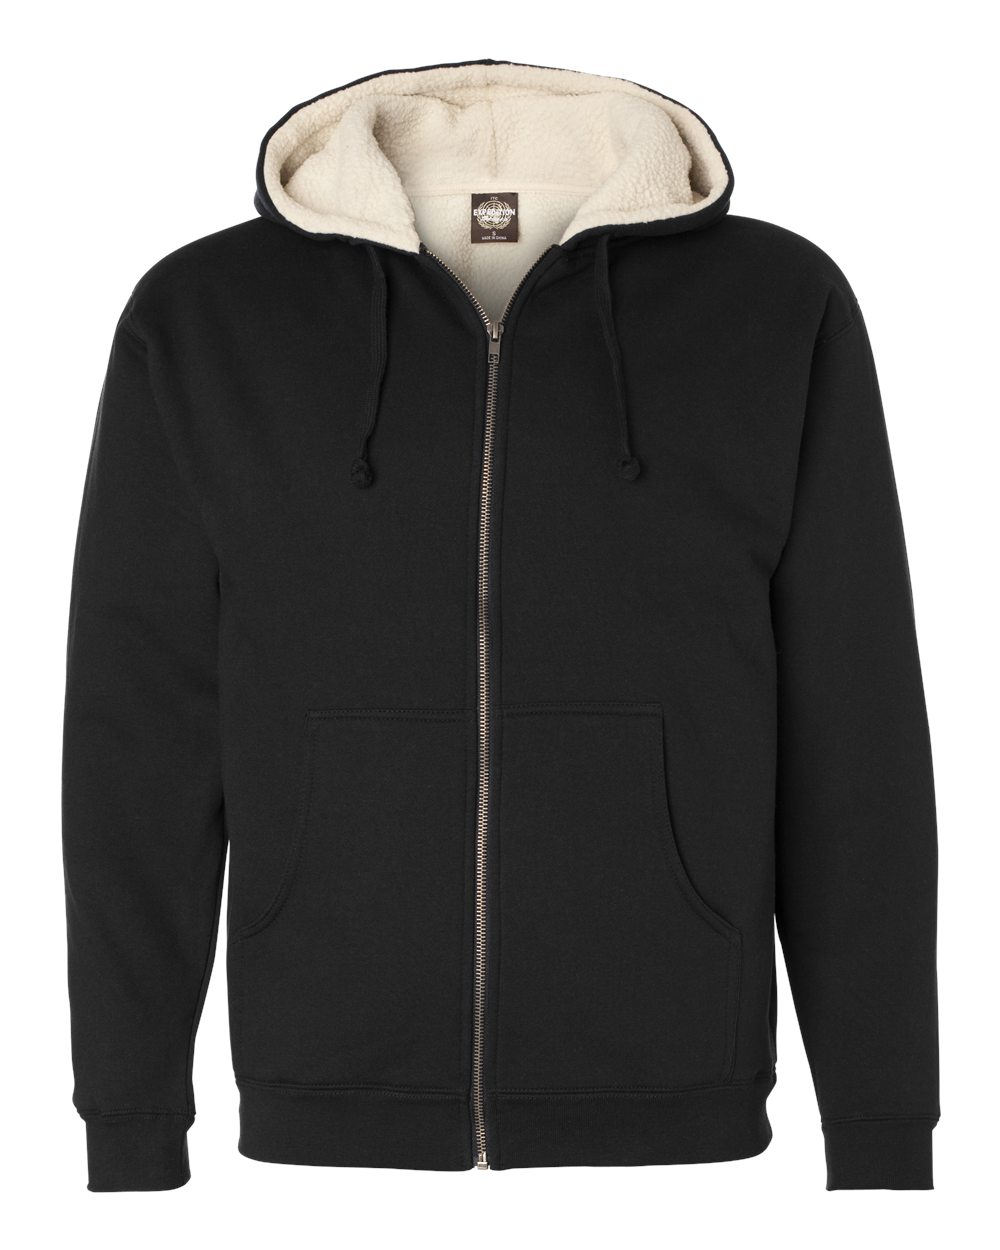 Sherpa-Lined Full-Zip Hooded Sweatshirt